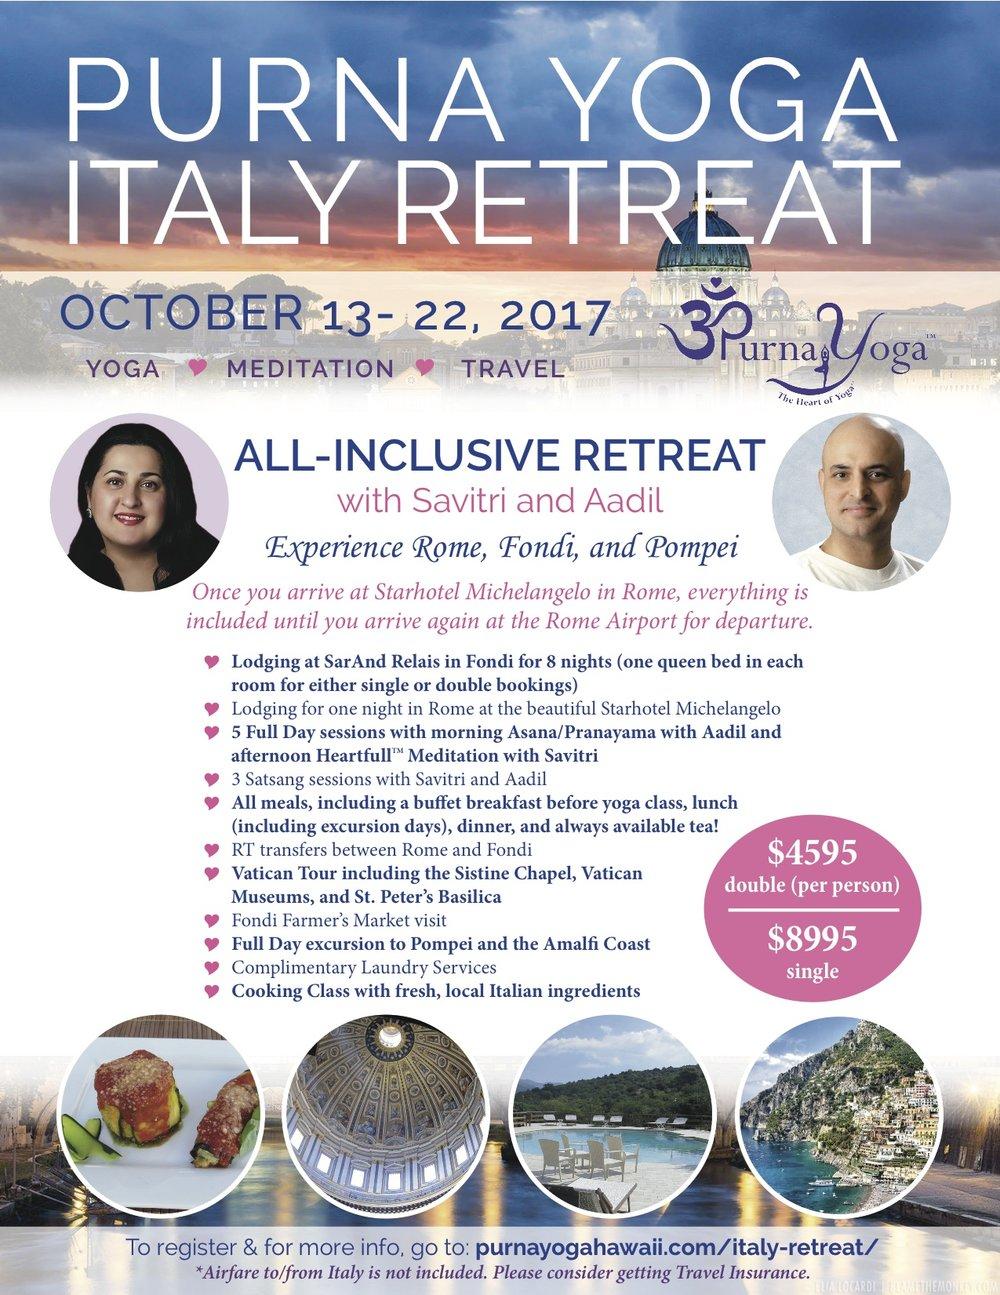 Italy_Retreat_FINAL-1.jpg